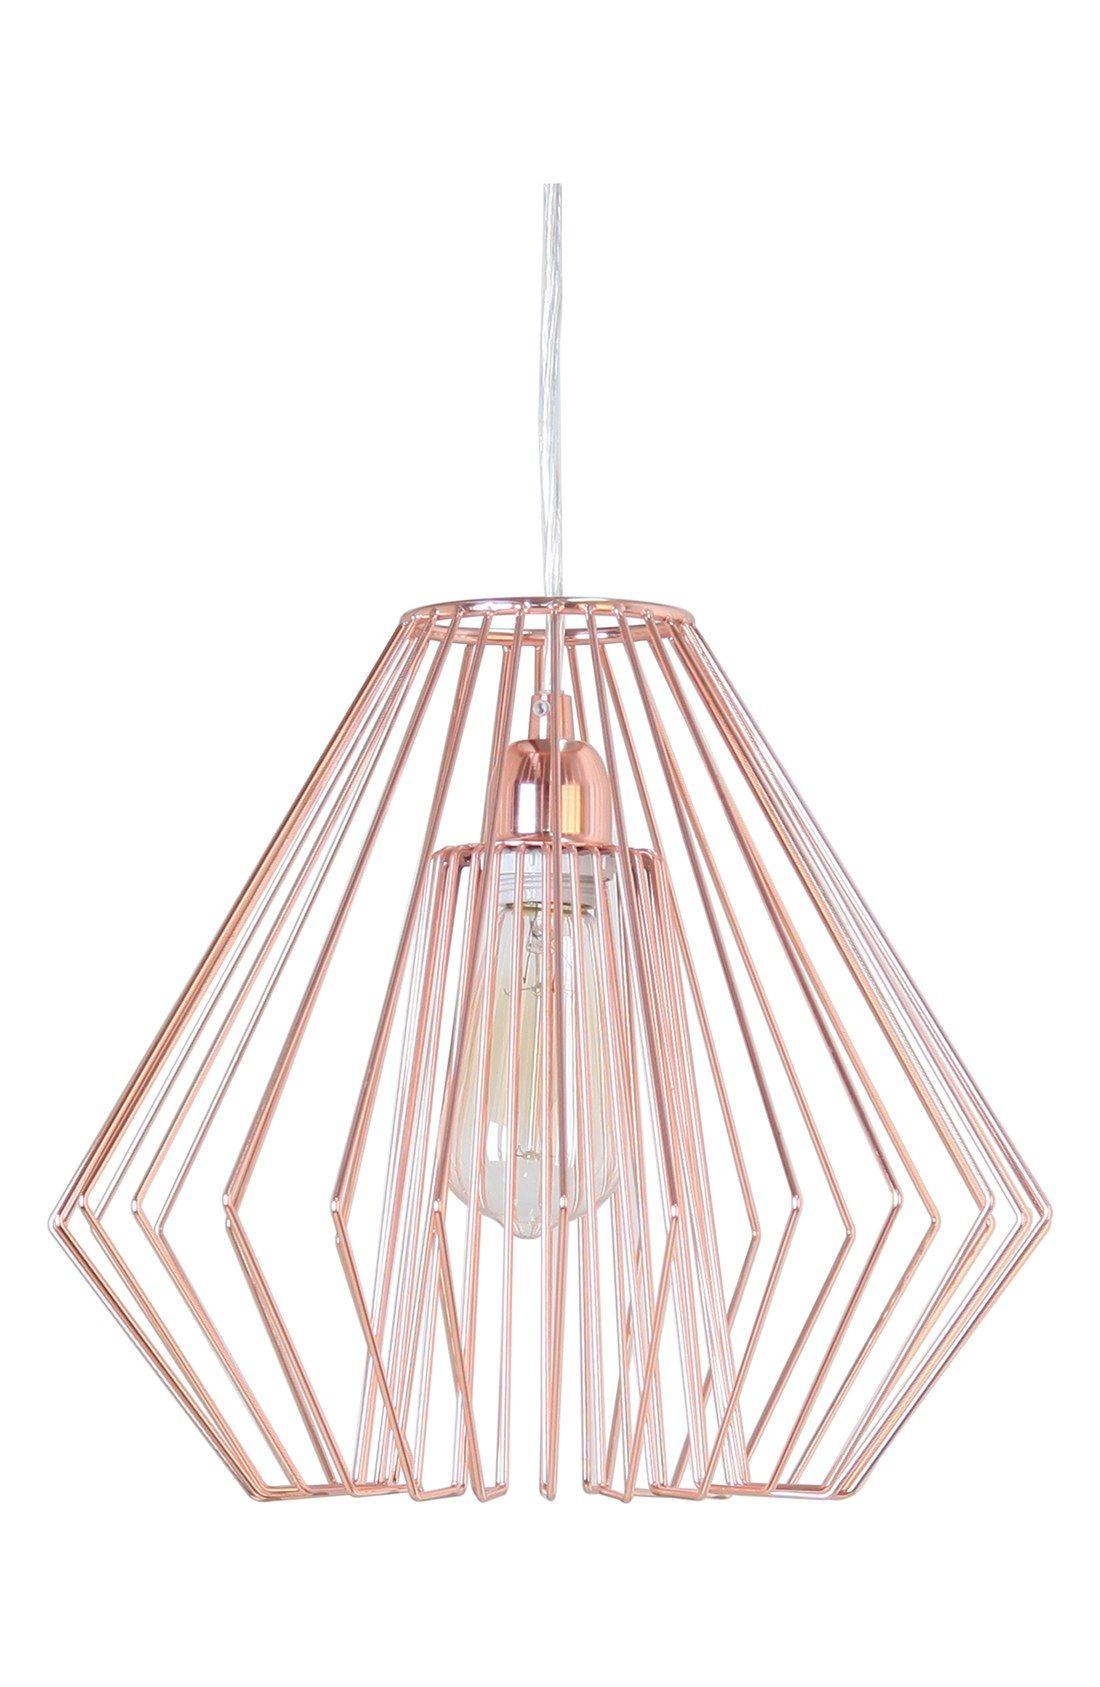 Crystal Art Gallery Metallic Hanging Lamp Rose Gold Lamp